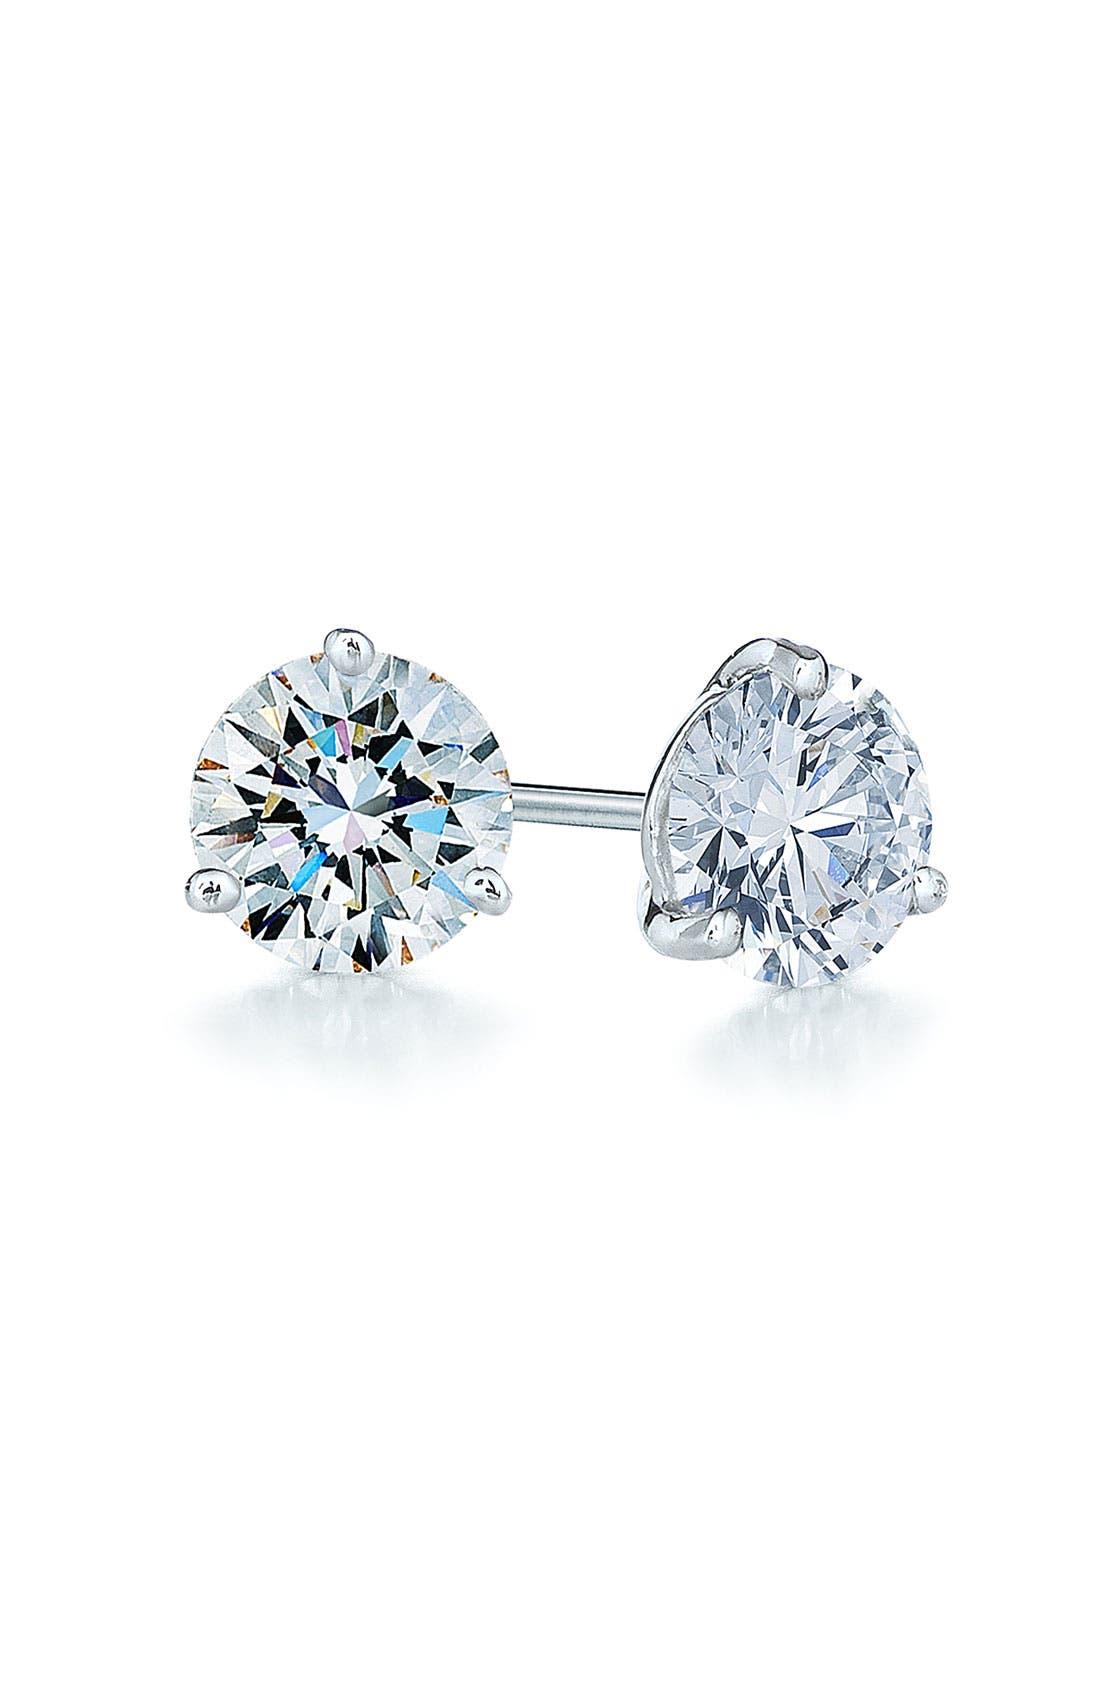 0.75ct tw Diamond & Platinum Stud Earrings,                         Main,                         color, PLATINUM